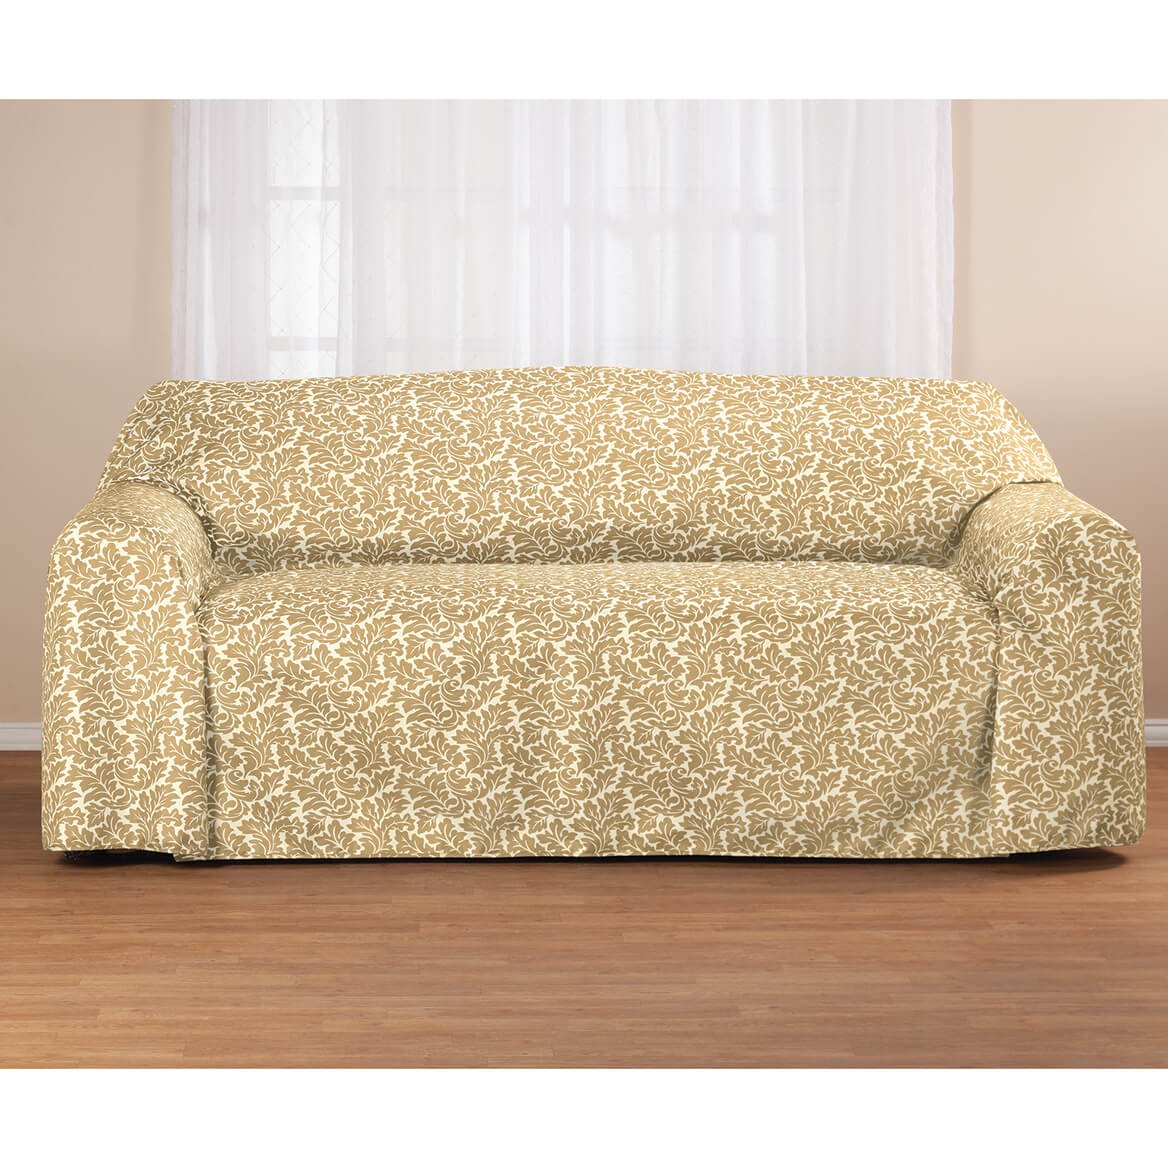 Amazon.com: Fundas de muebles – sofá grande funda: 70